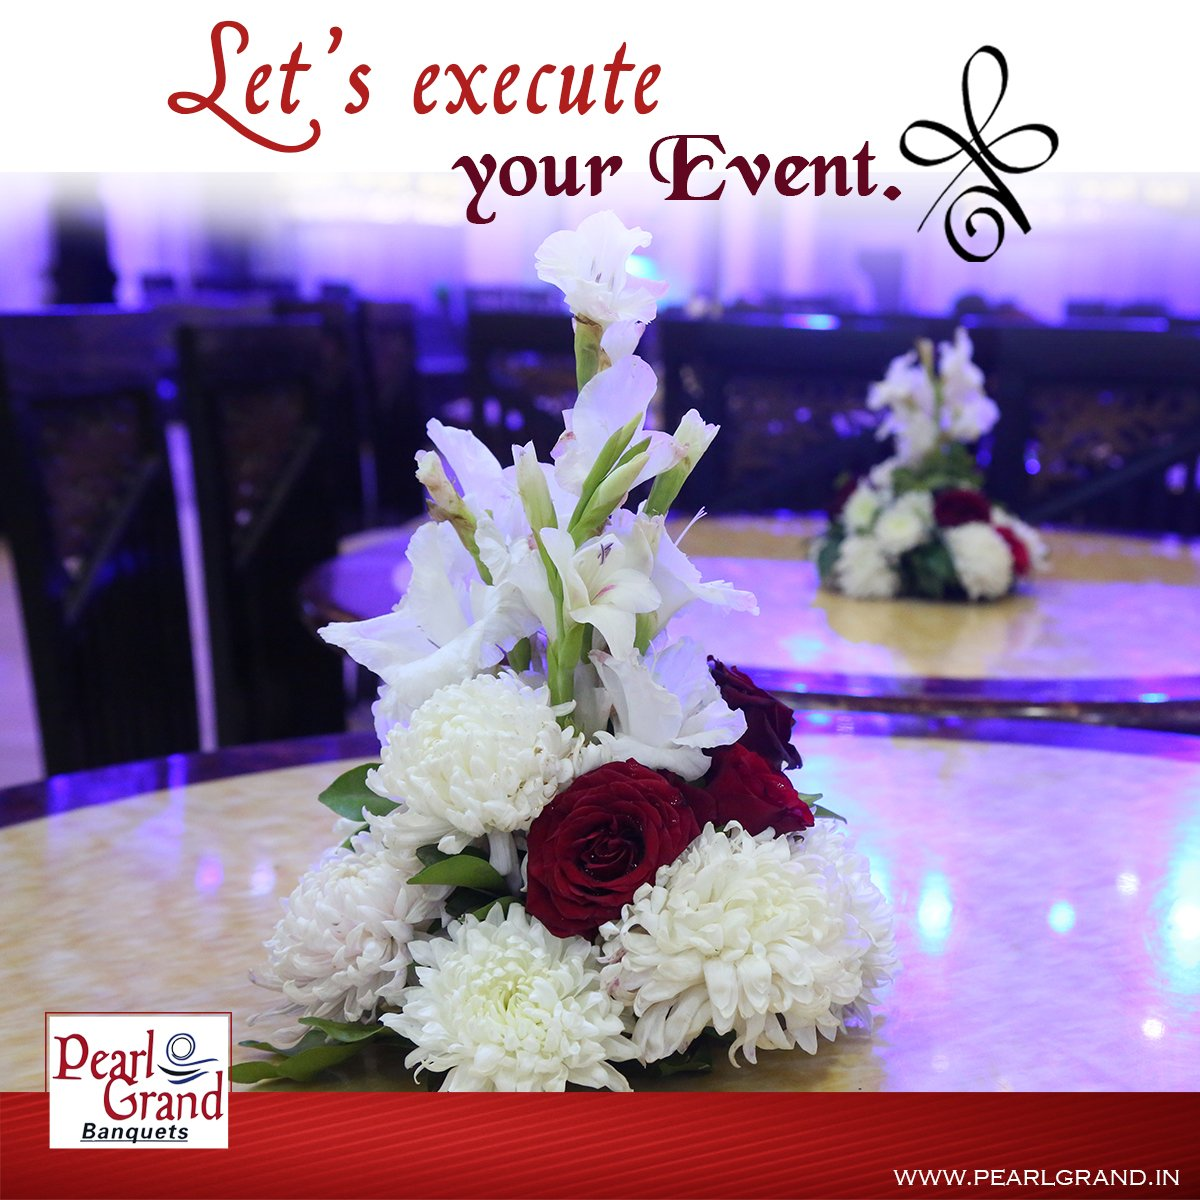 Let's execute your Event. #PearlGrandBanquets #PearlGrand #Weddings #Marriages #DelhiNCR https://t.co/OwjhZROSID